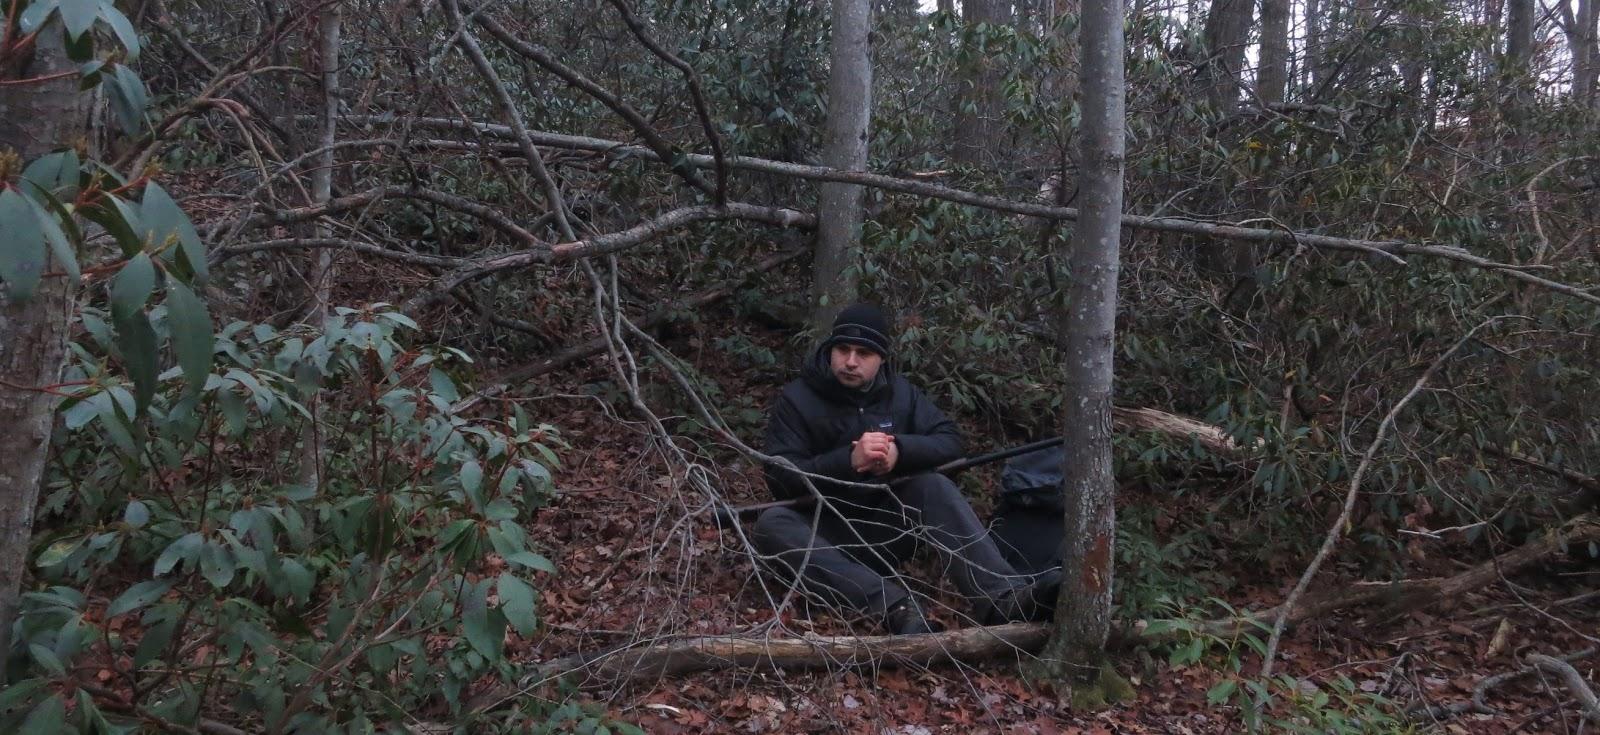 Wood Trekker Trip Report Beaver Pond Duck Hunting 12 19